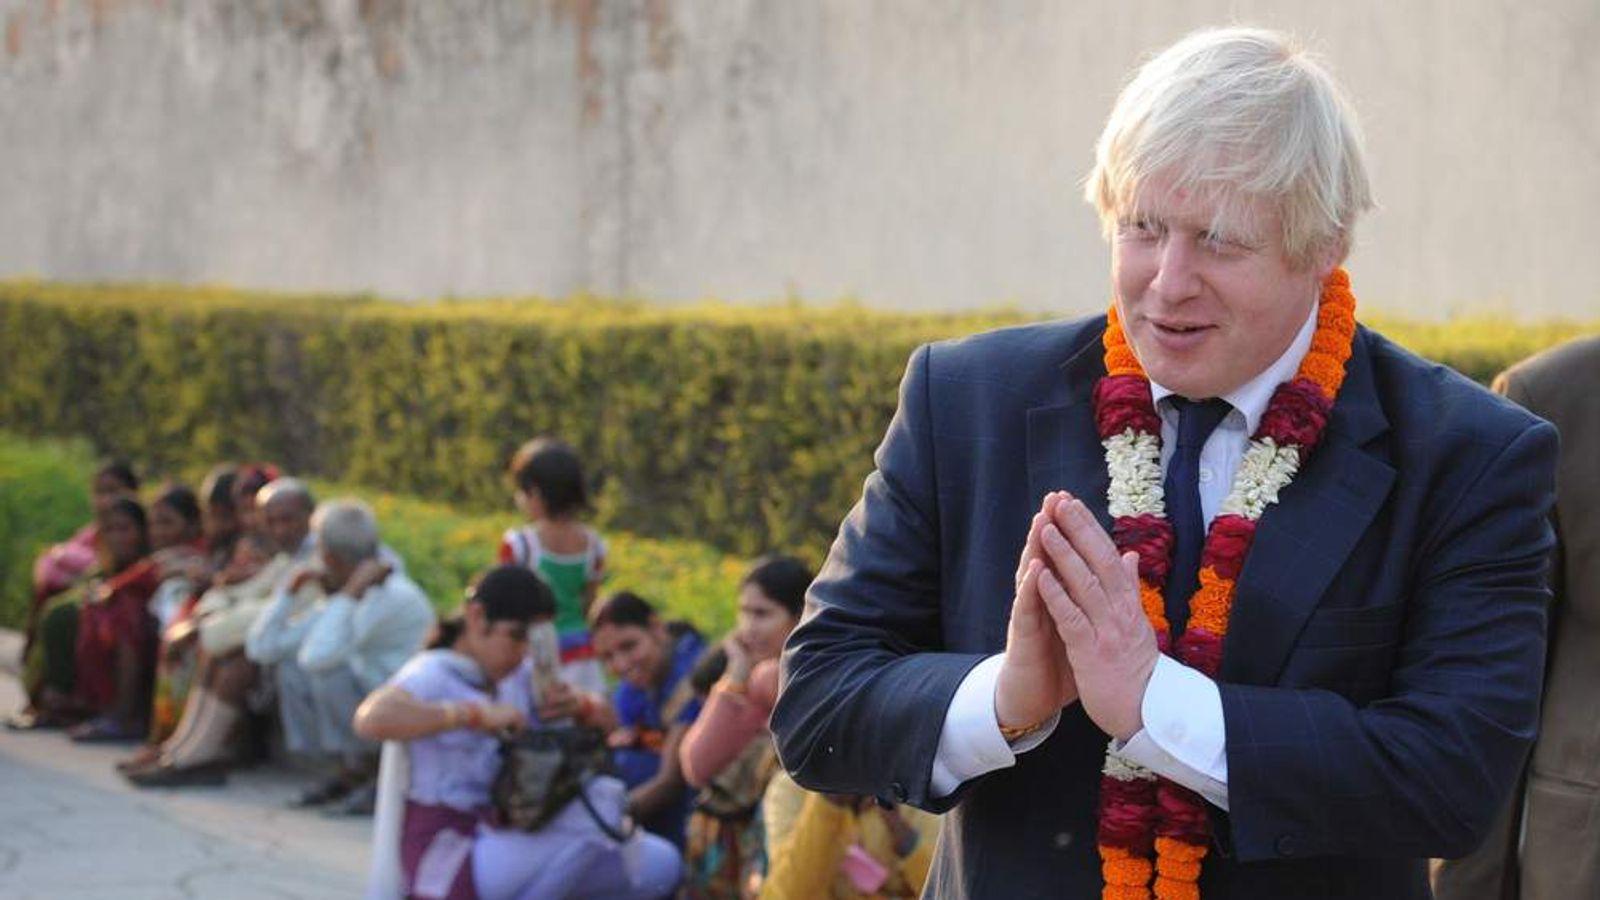 London Mayor Boris Johnson visits the Akshardham Temple in New Delhi